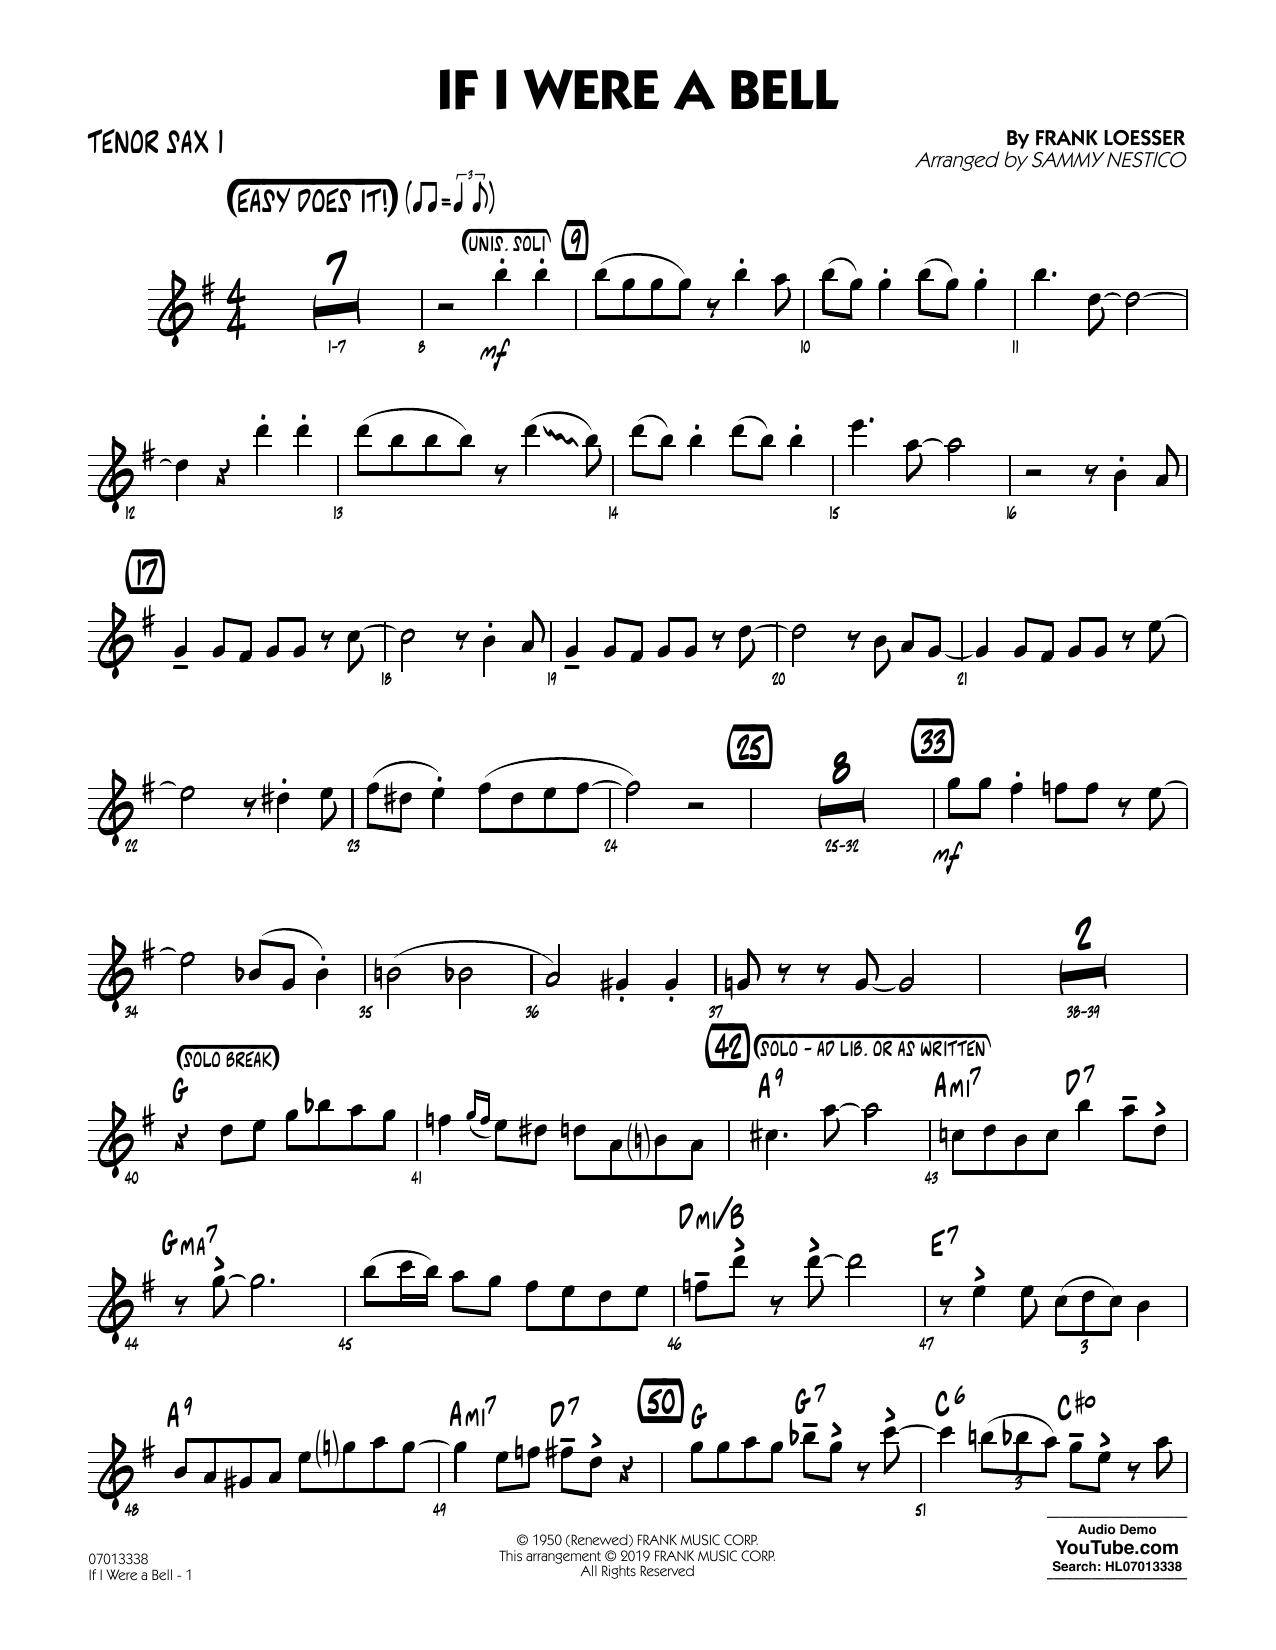 If I Were a Bell (arr. Sammy Nestico) - Tenor Sax 1 (Jazz Ensemble)